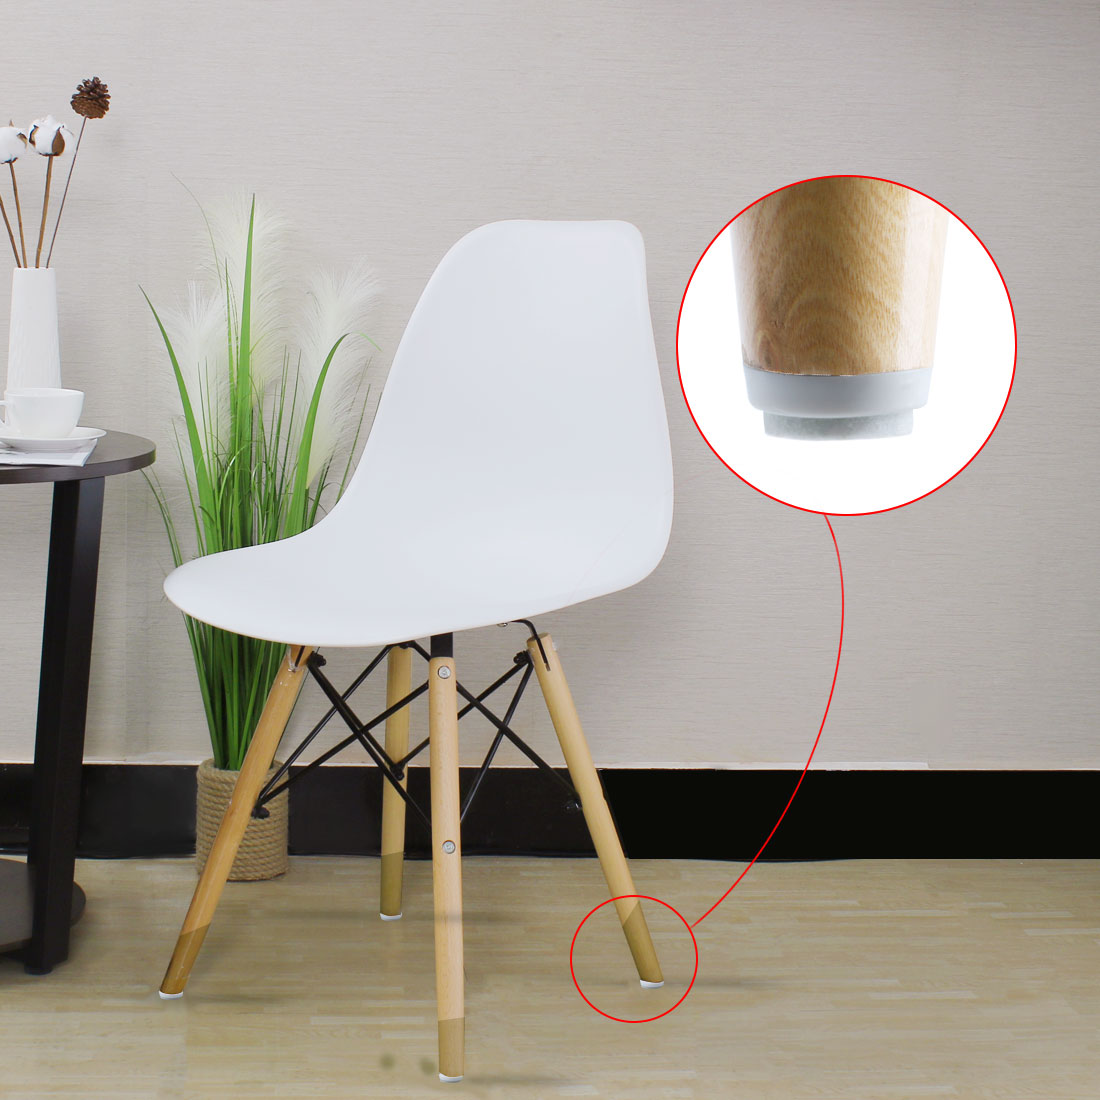 "18pcs Nail on Felt Pads for Furniture Chair Leg 3/4"" 18mm Dia Floor Protector - image 3 de 7"